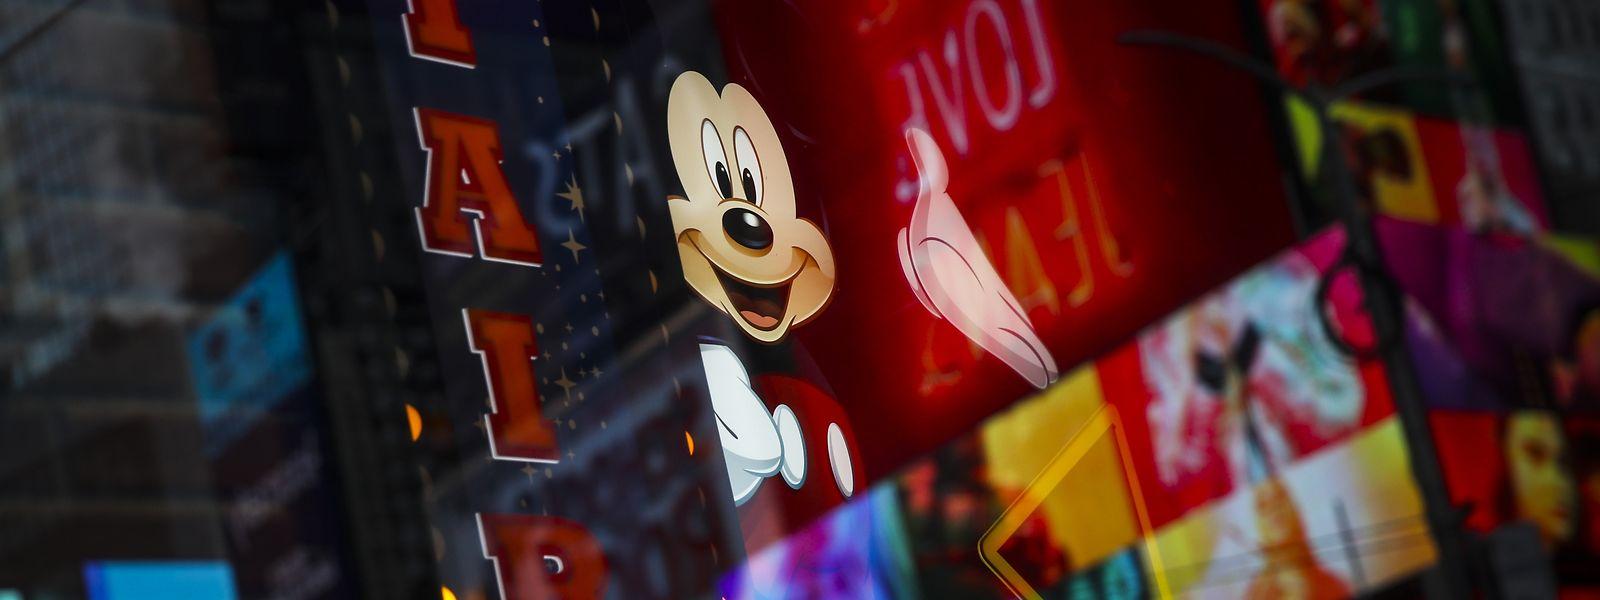 Le bénéfice net de Disney, au 3e trimestre de son exercice, était en chute de 51%.